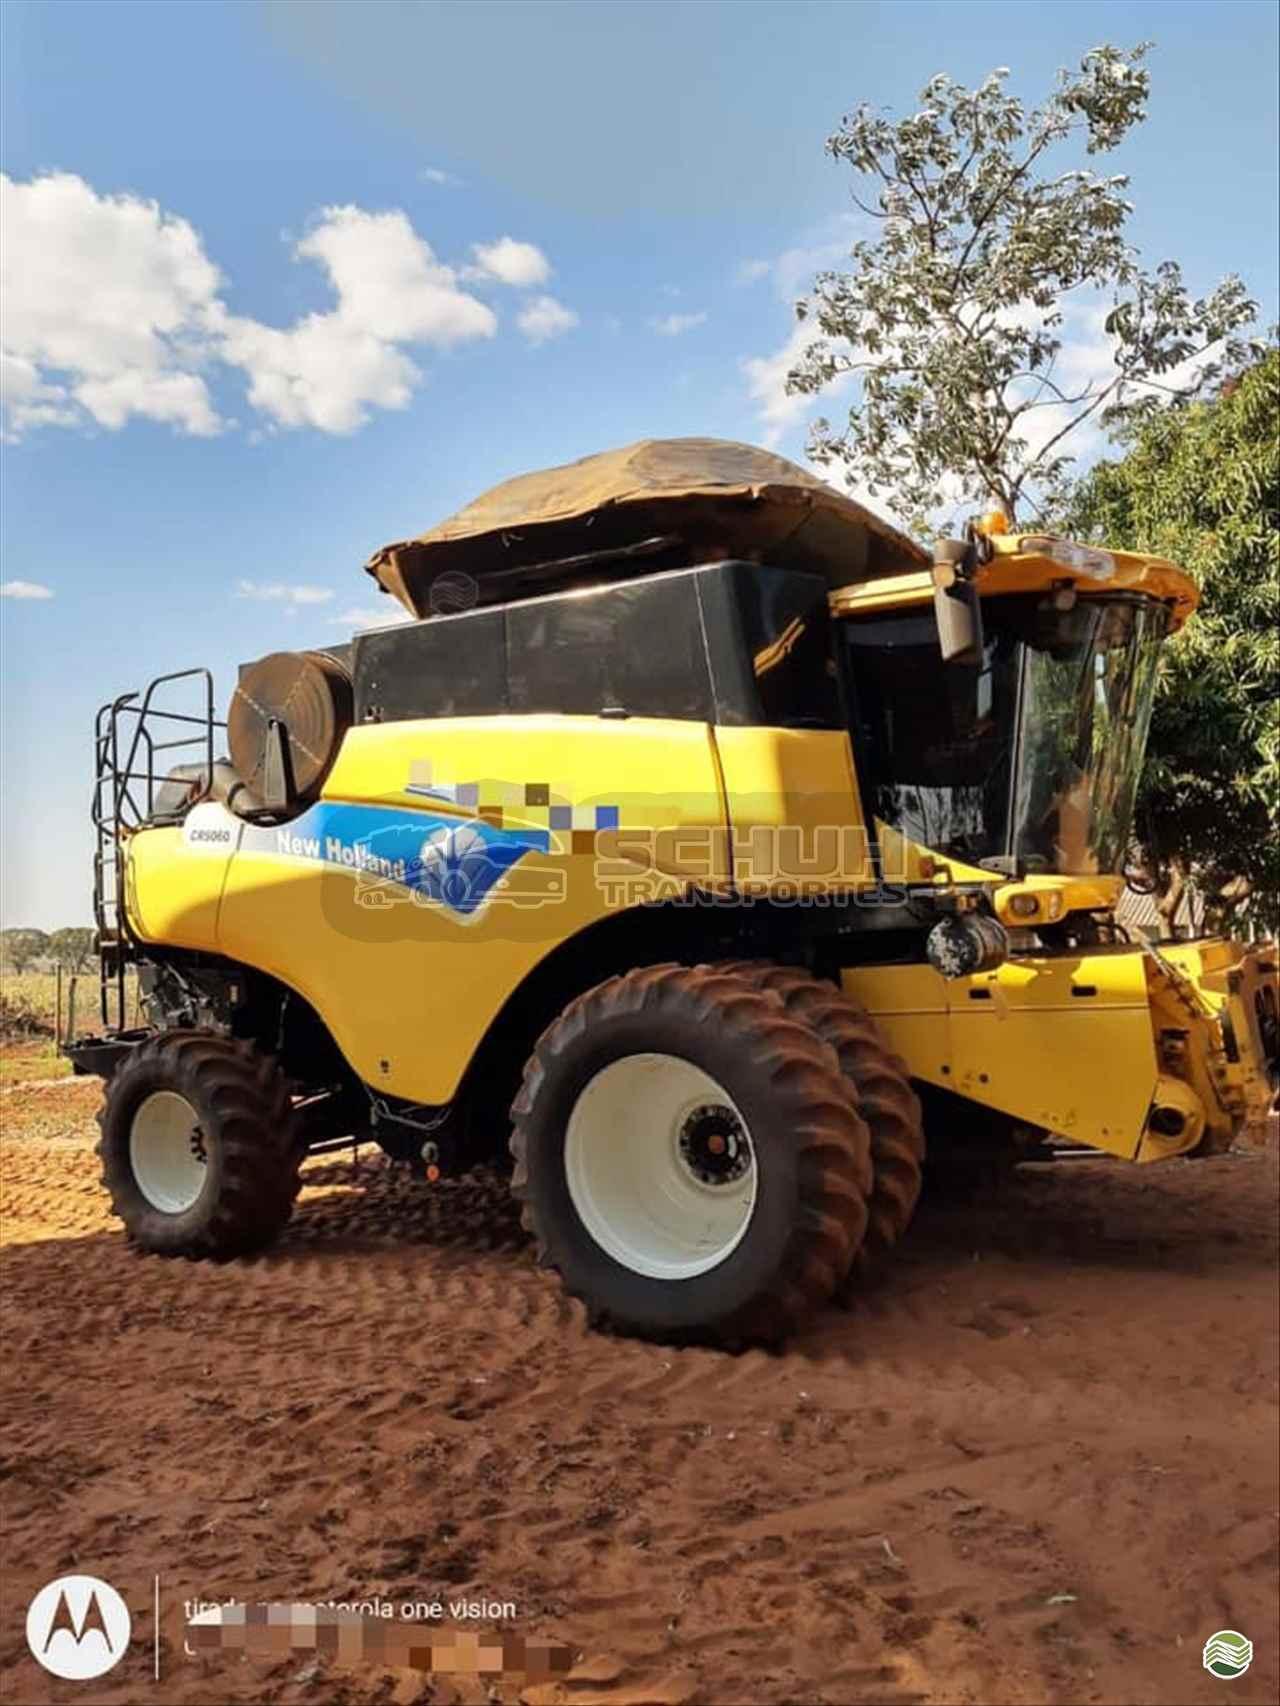 COLHEITADEIRA NEW HOLLAND CR 9060 Schuh Transportes e Vendas Agrícolas MARECHAL CANDIDO RONDON PARANÁ PR